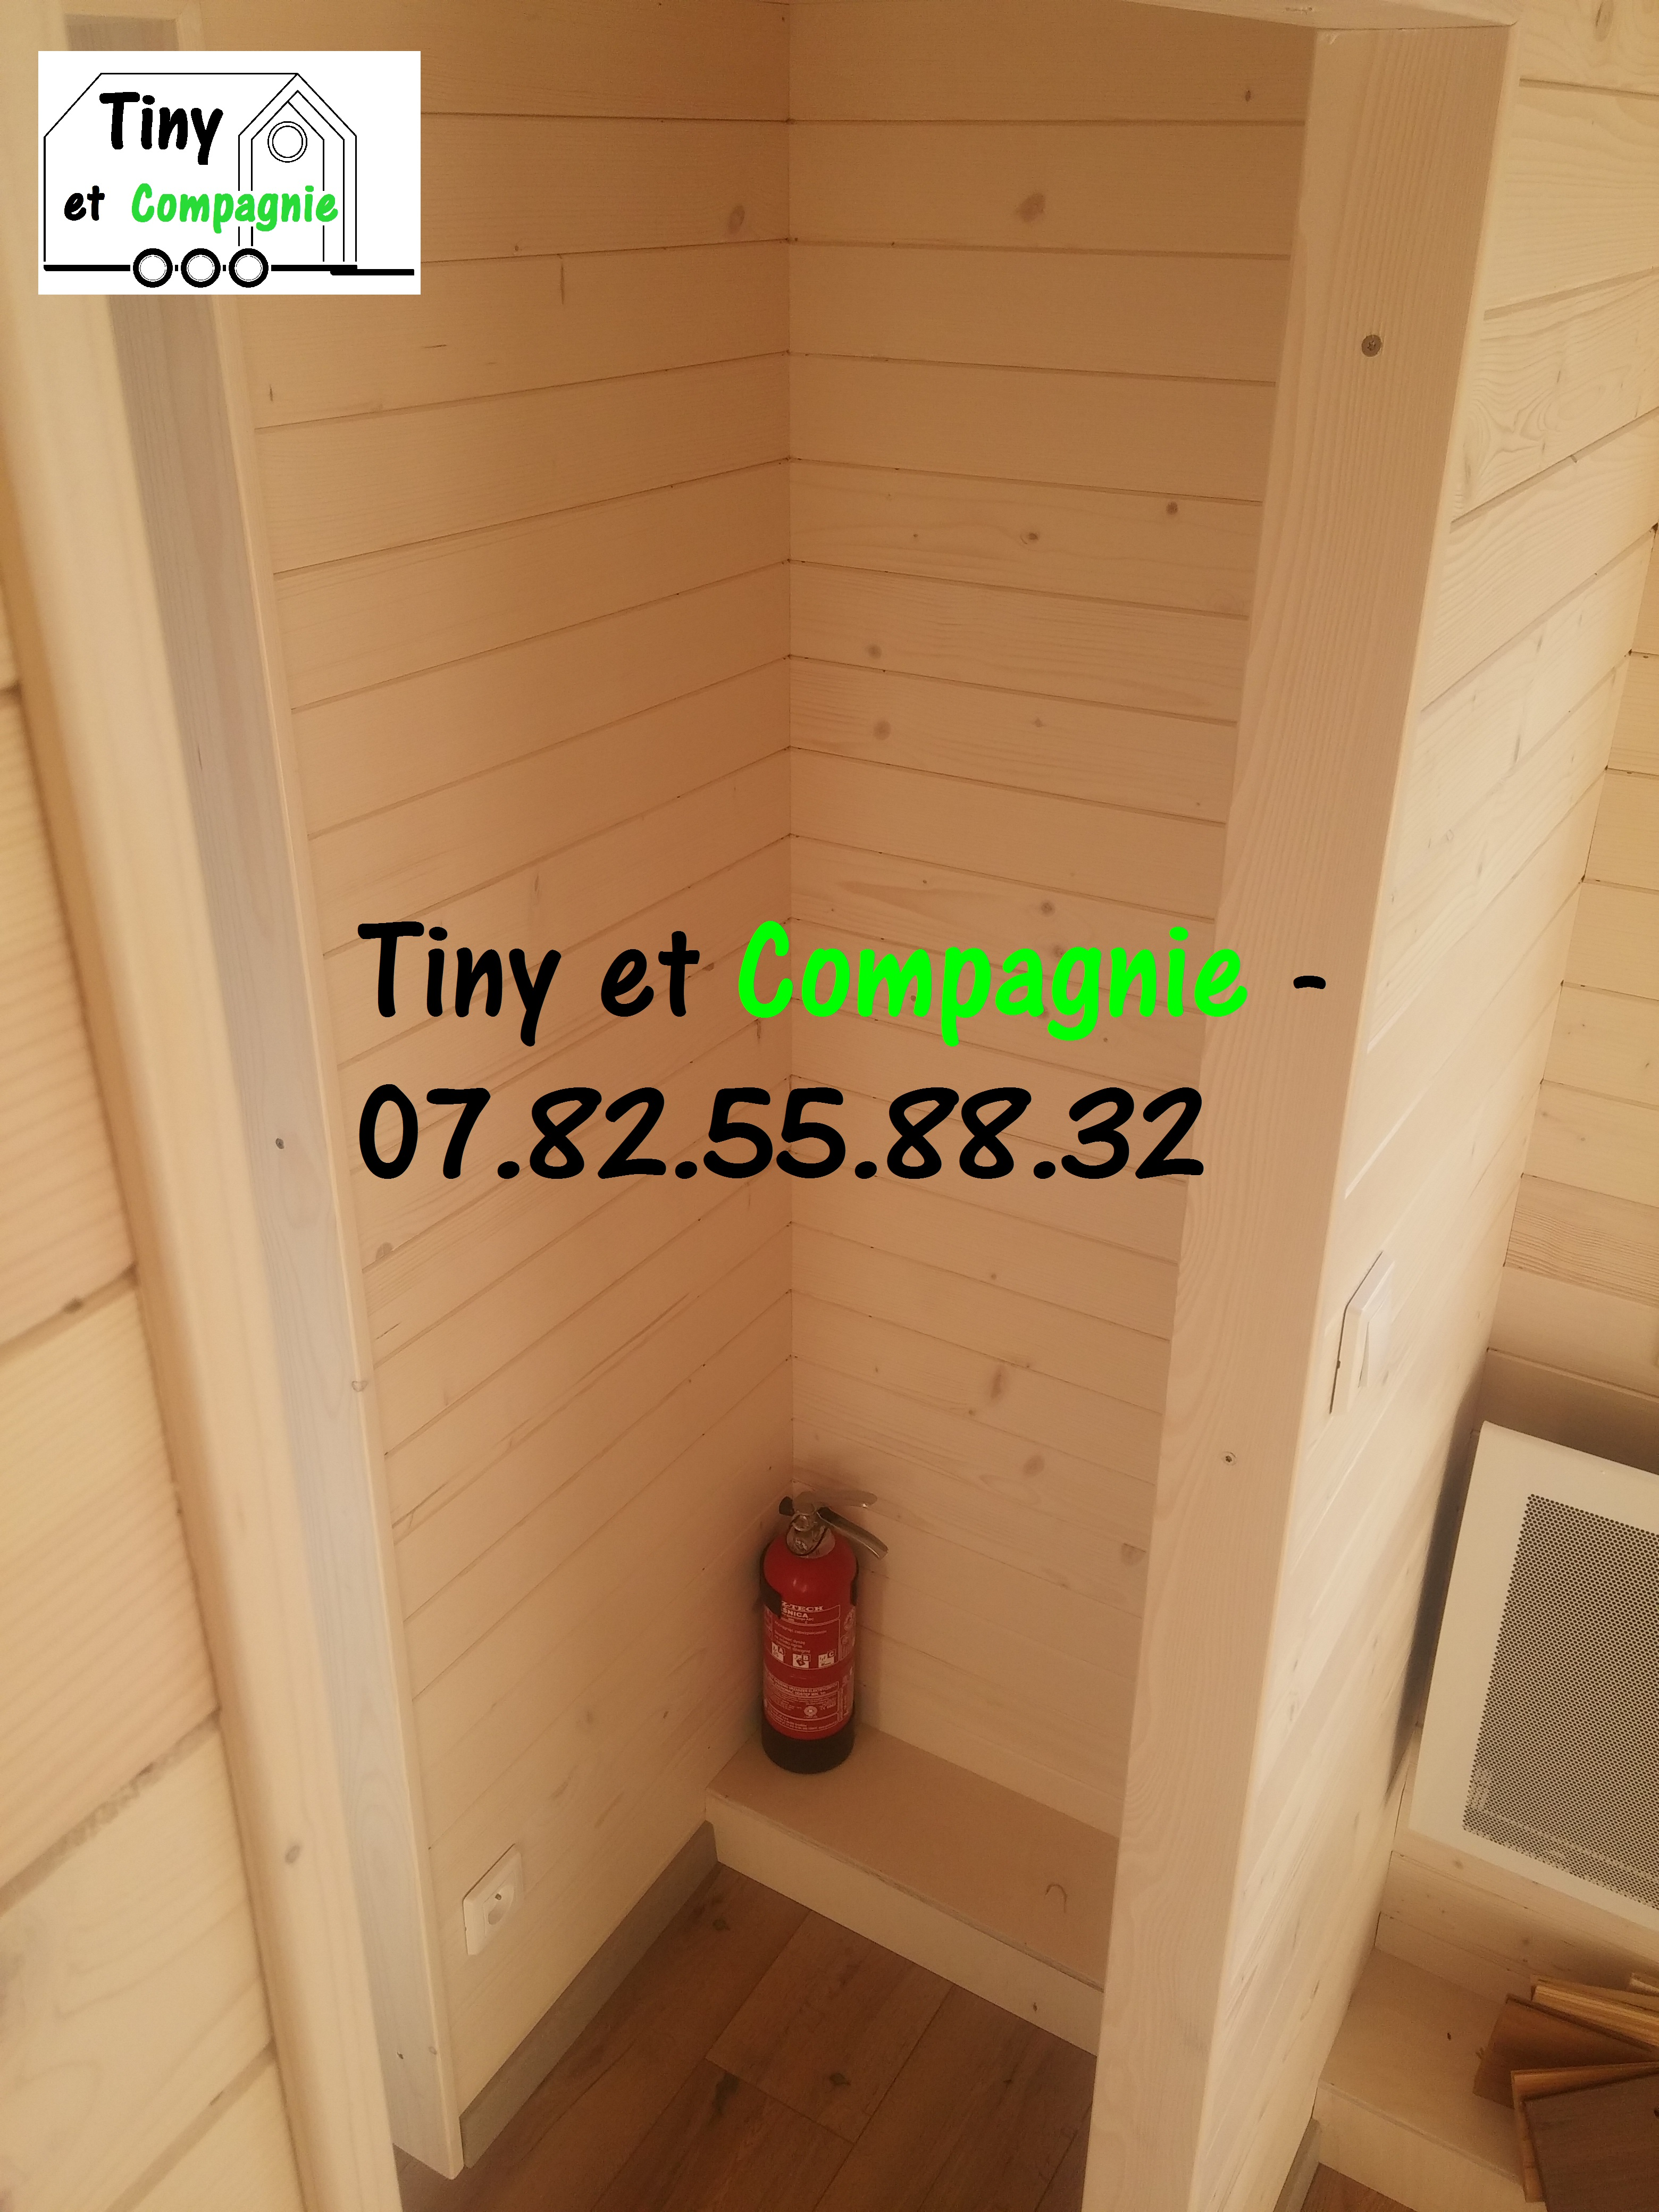 Tiny et Compagnie - Colibri 2019 (Rangem